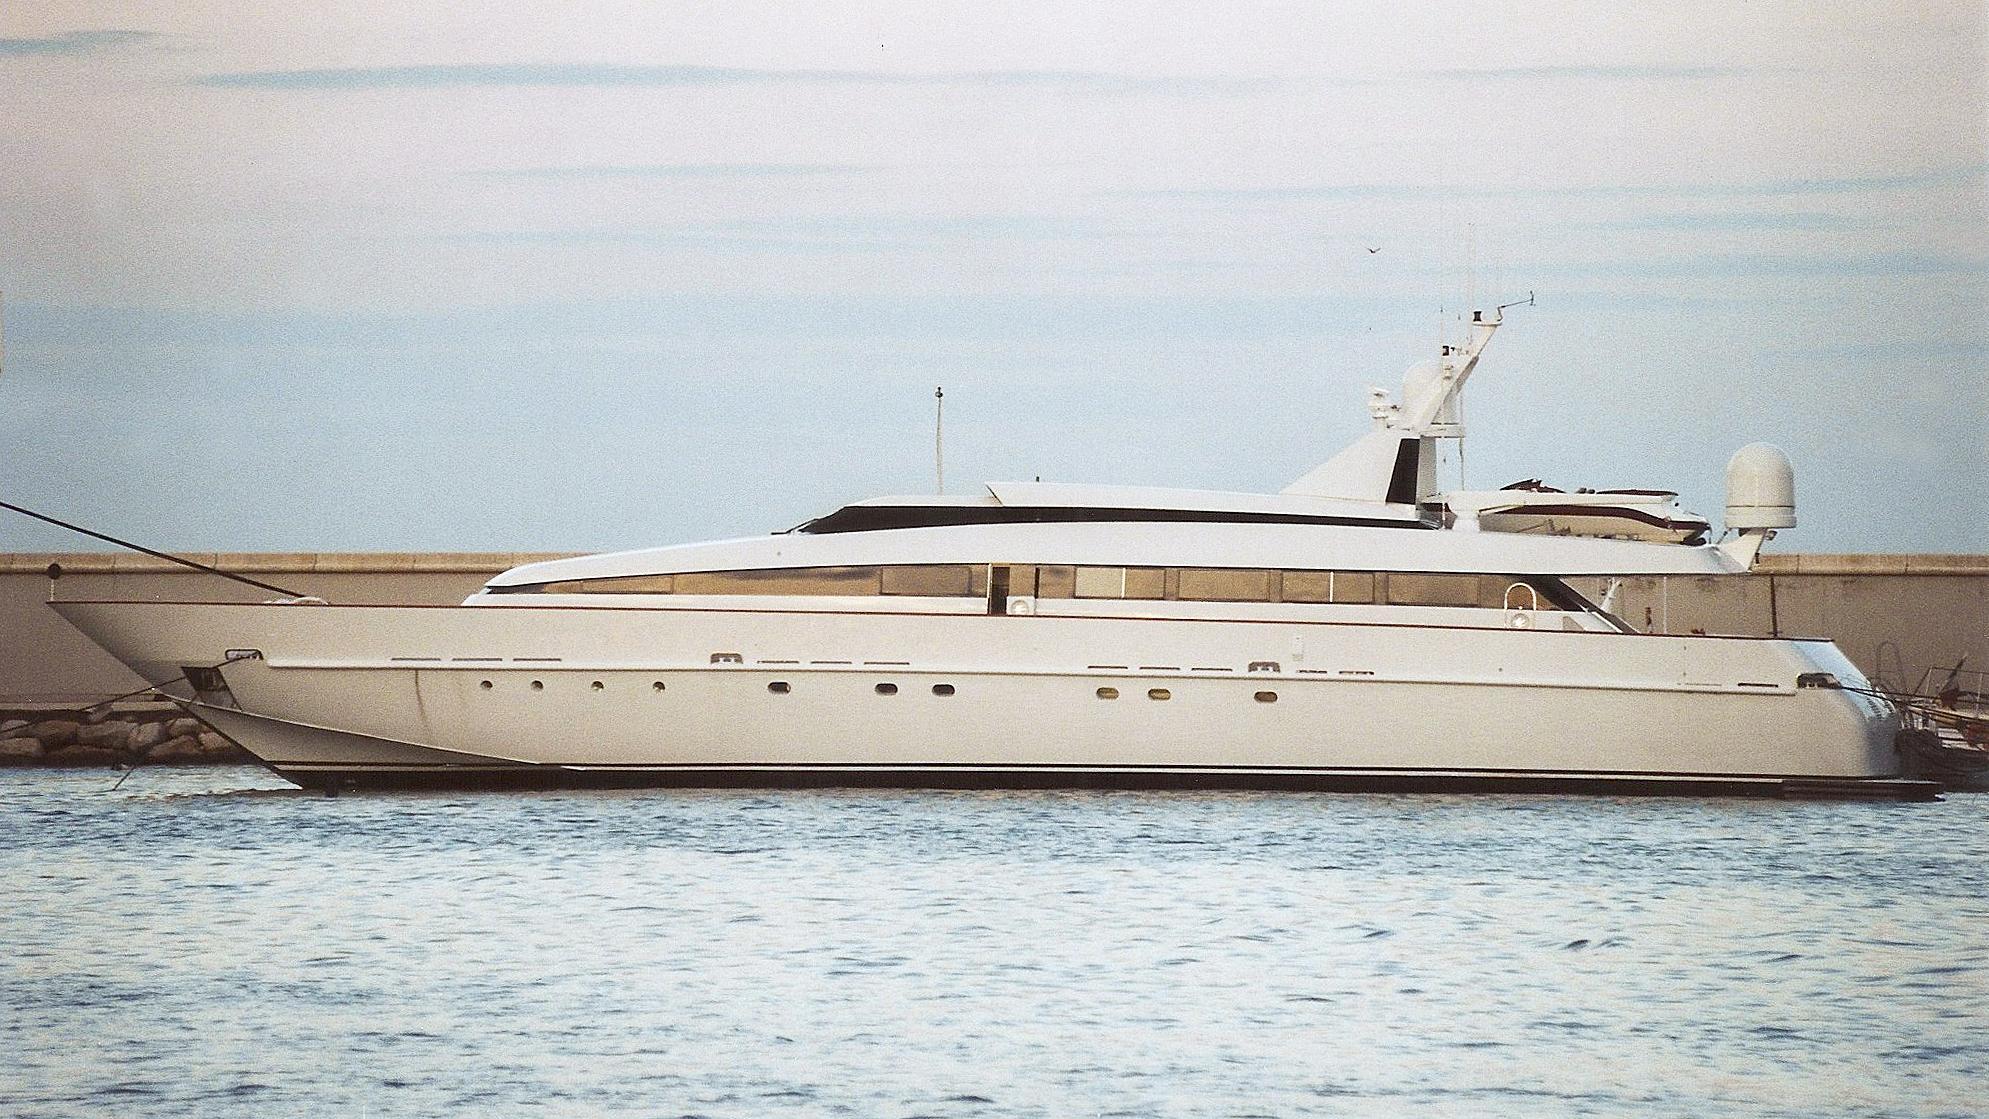 adler-motor-yacht-baglietto-1987-36m-profile